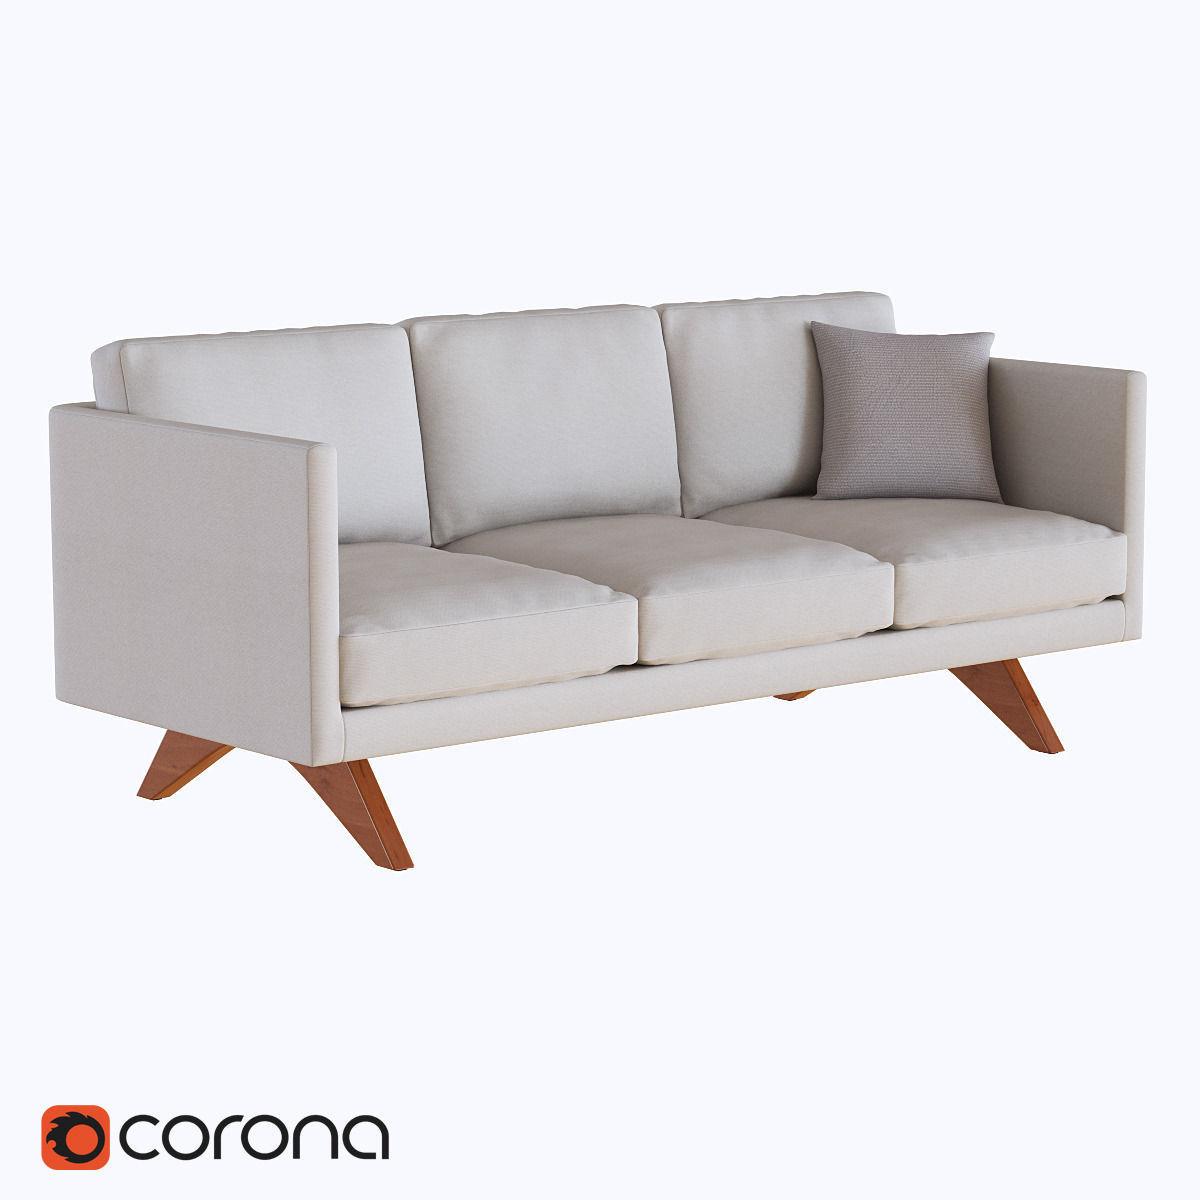 west elm brooklyn upholstered sofa 3d model max fbx 1 ...